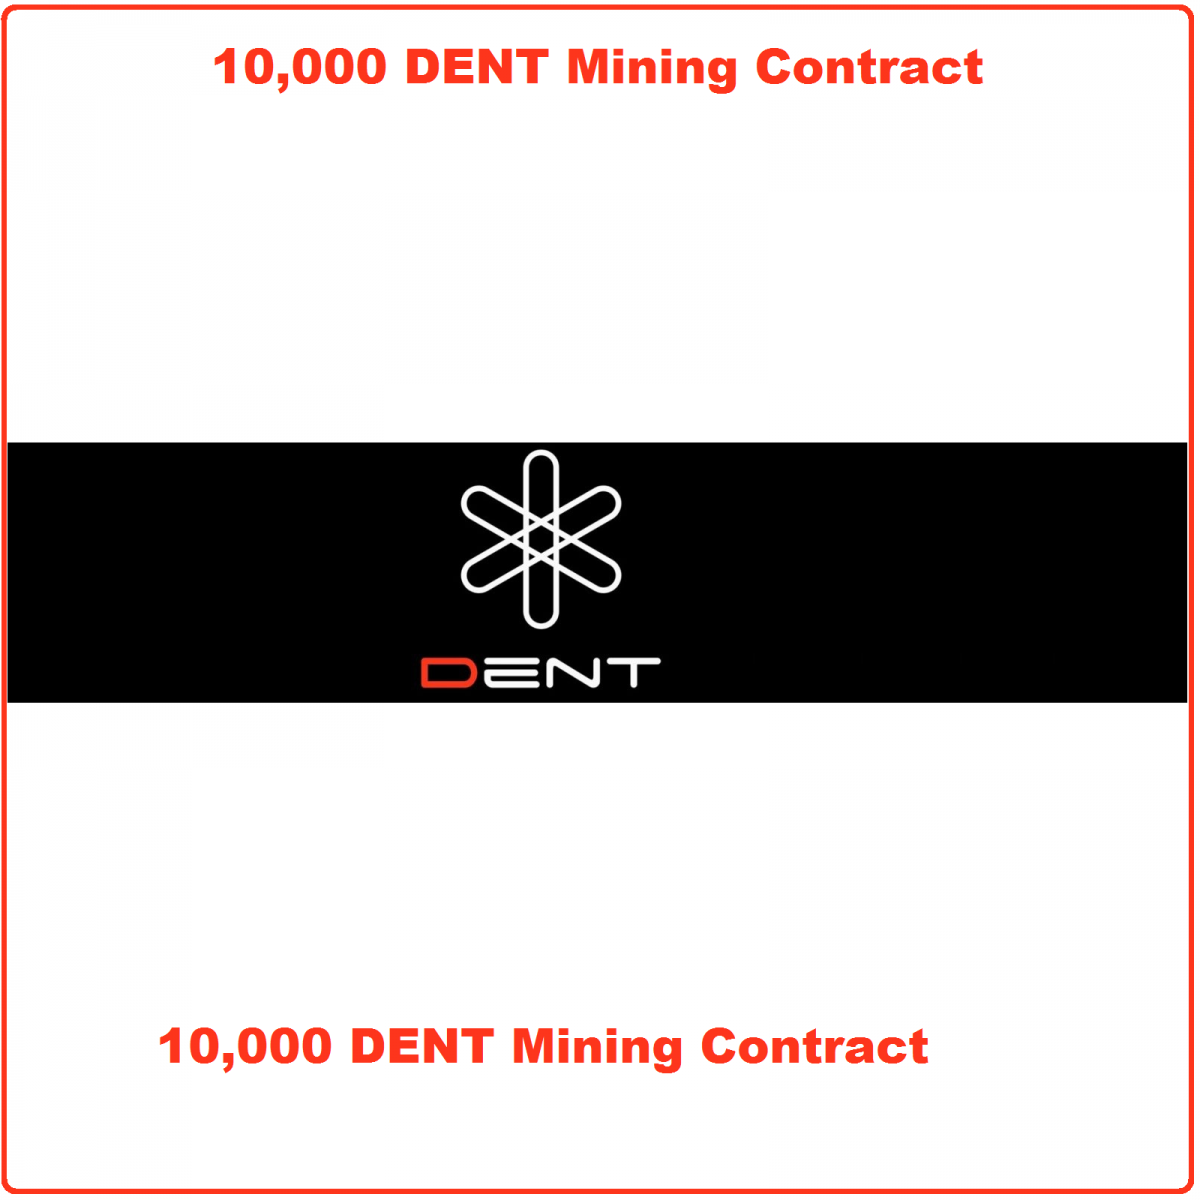 Dent Online Services